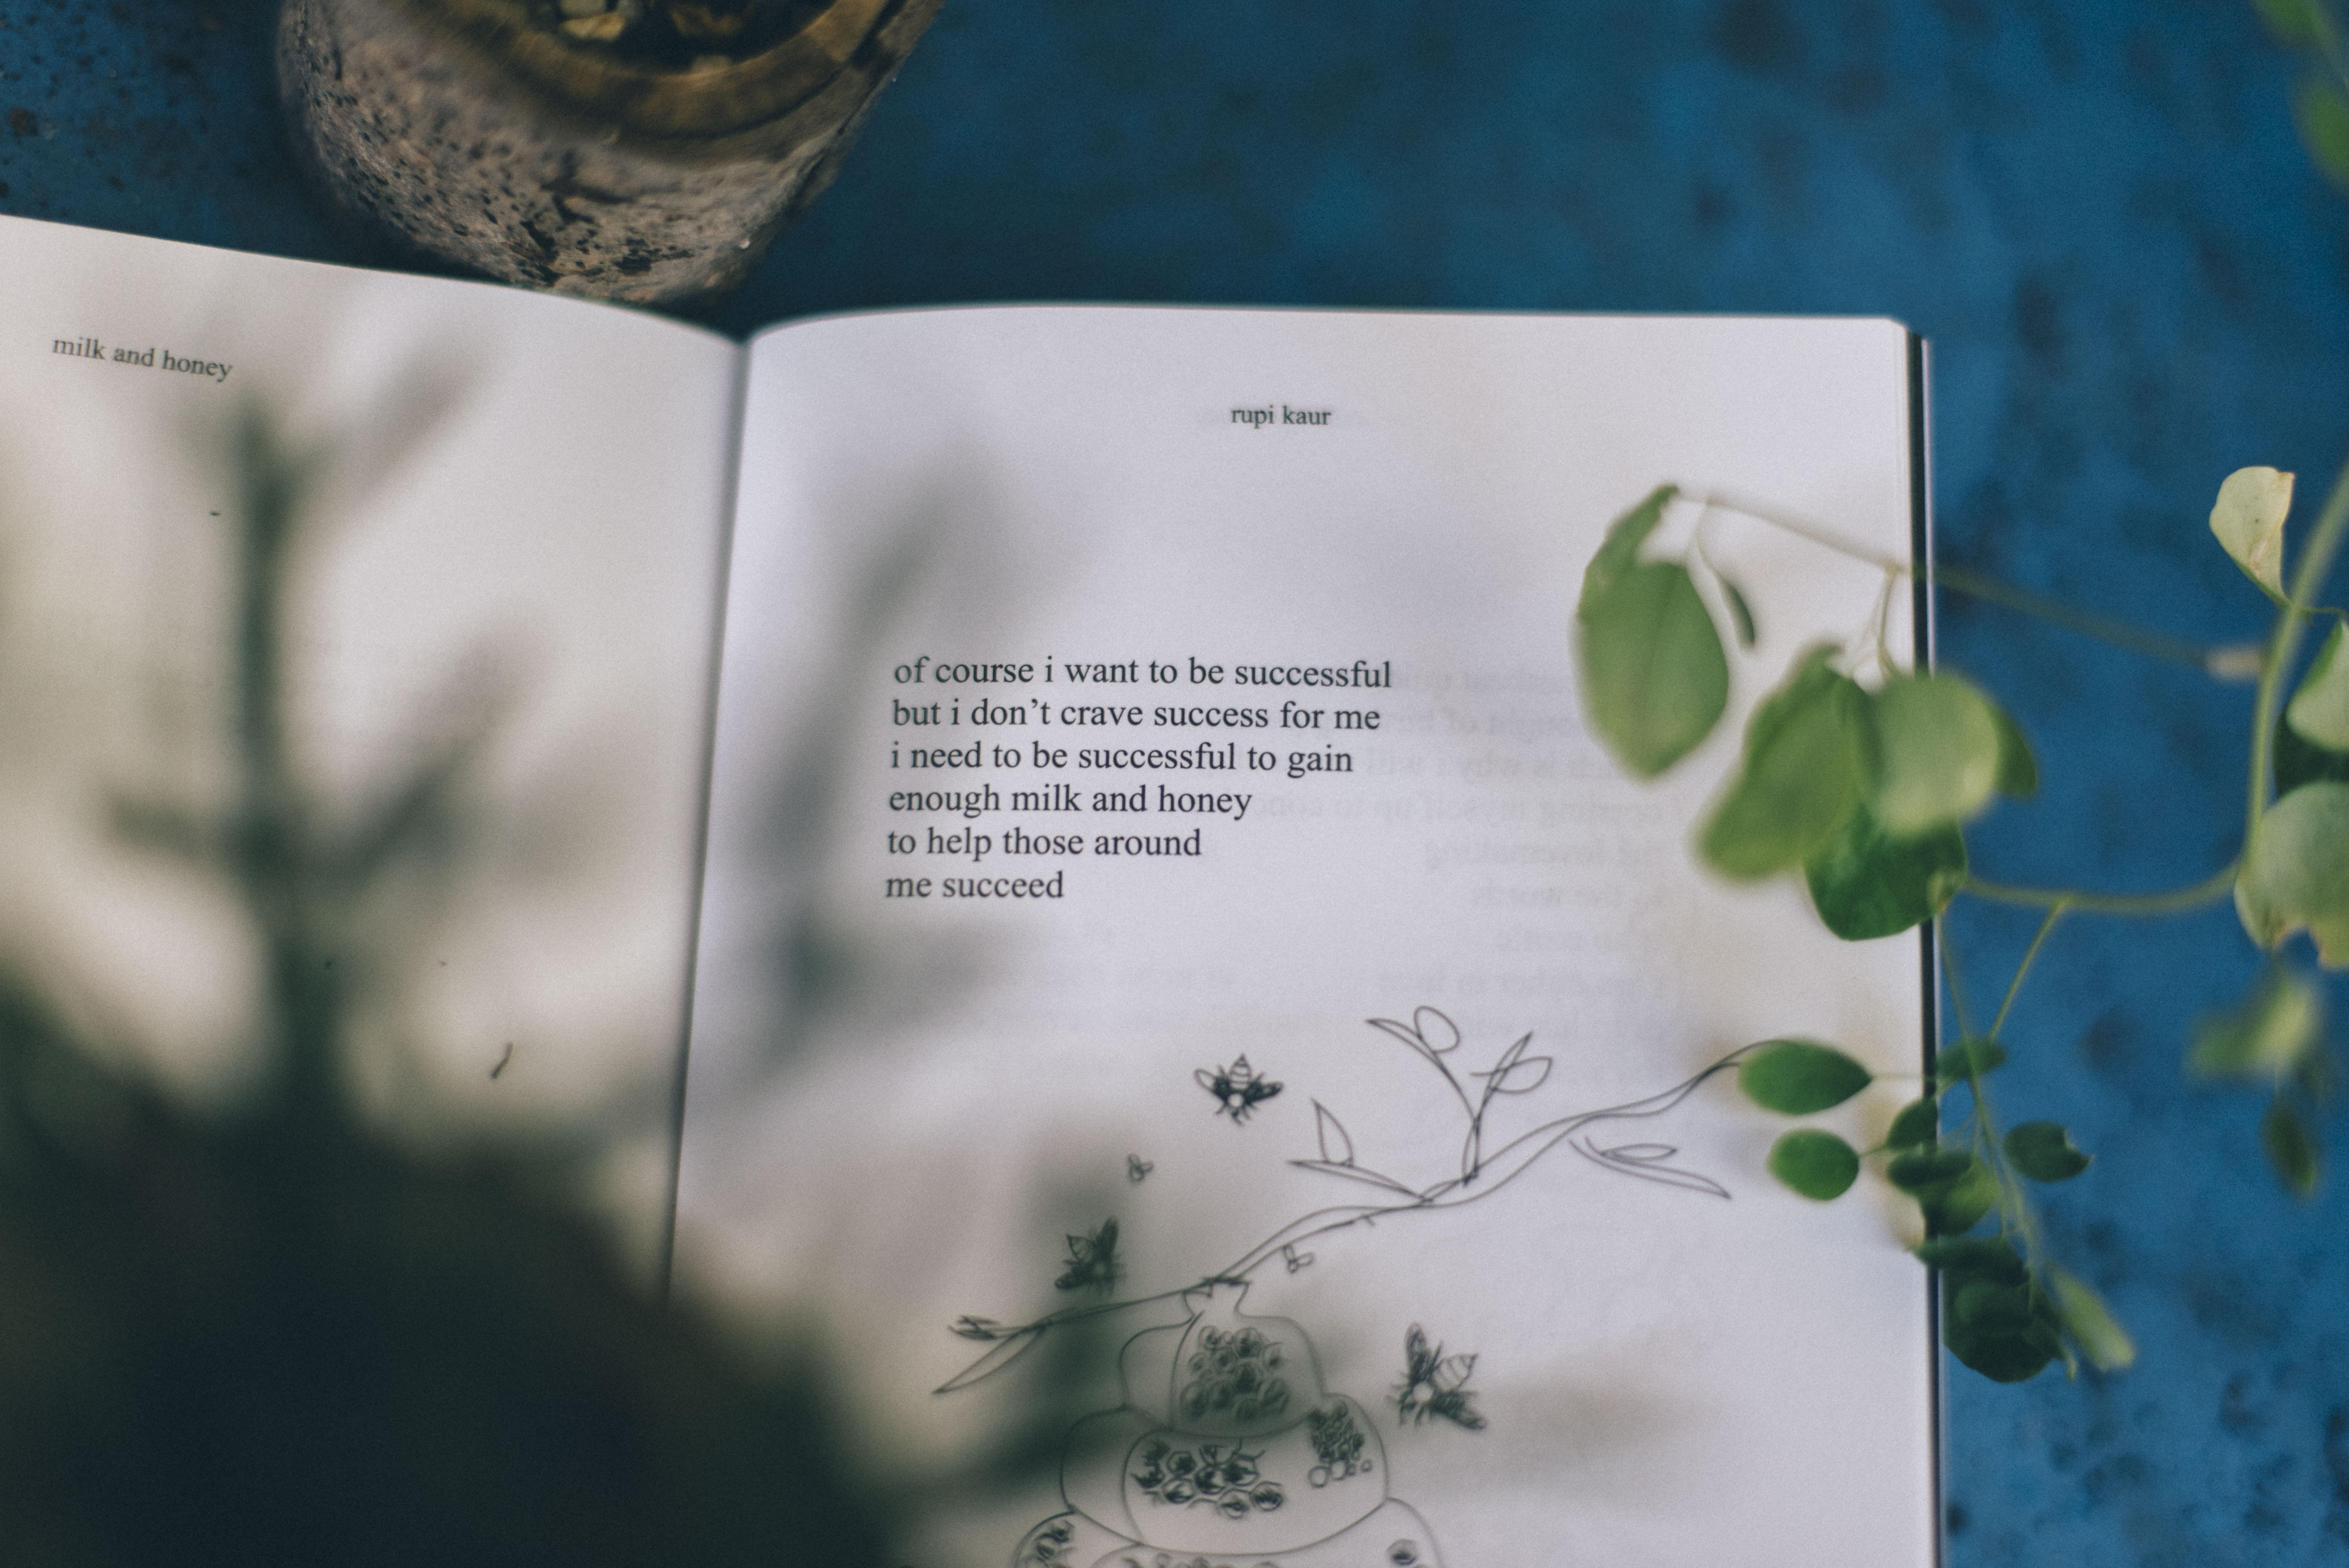 Poetry stories